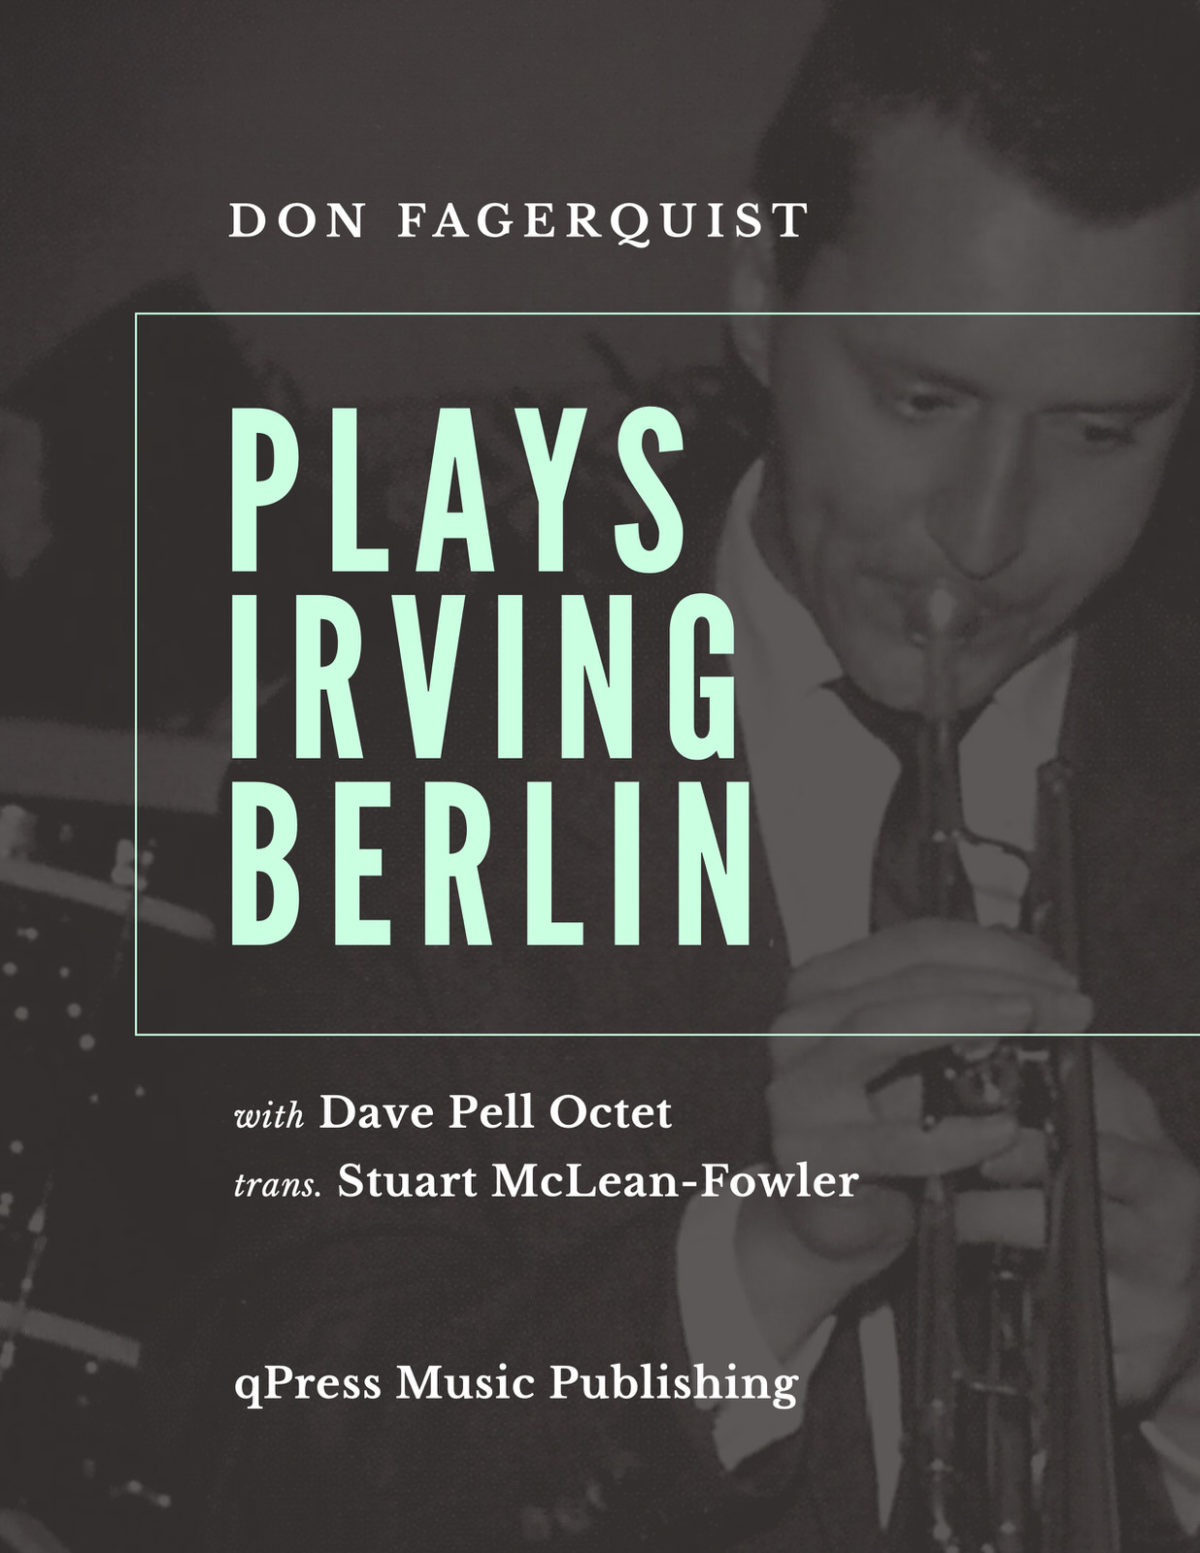 Fagerquist, Plays Irving Berlin